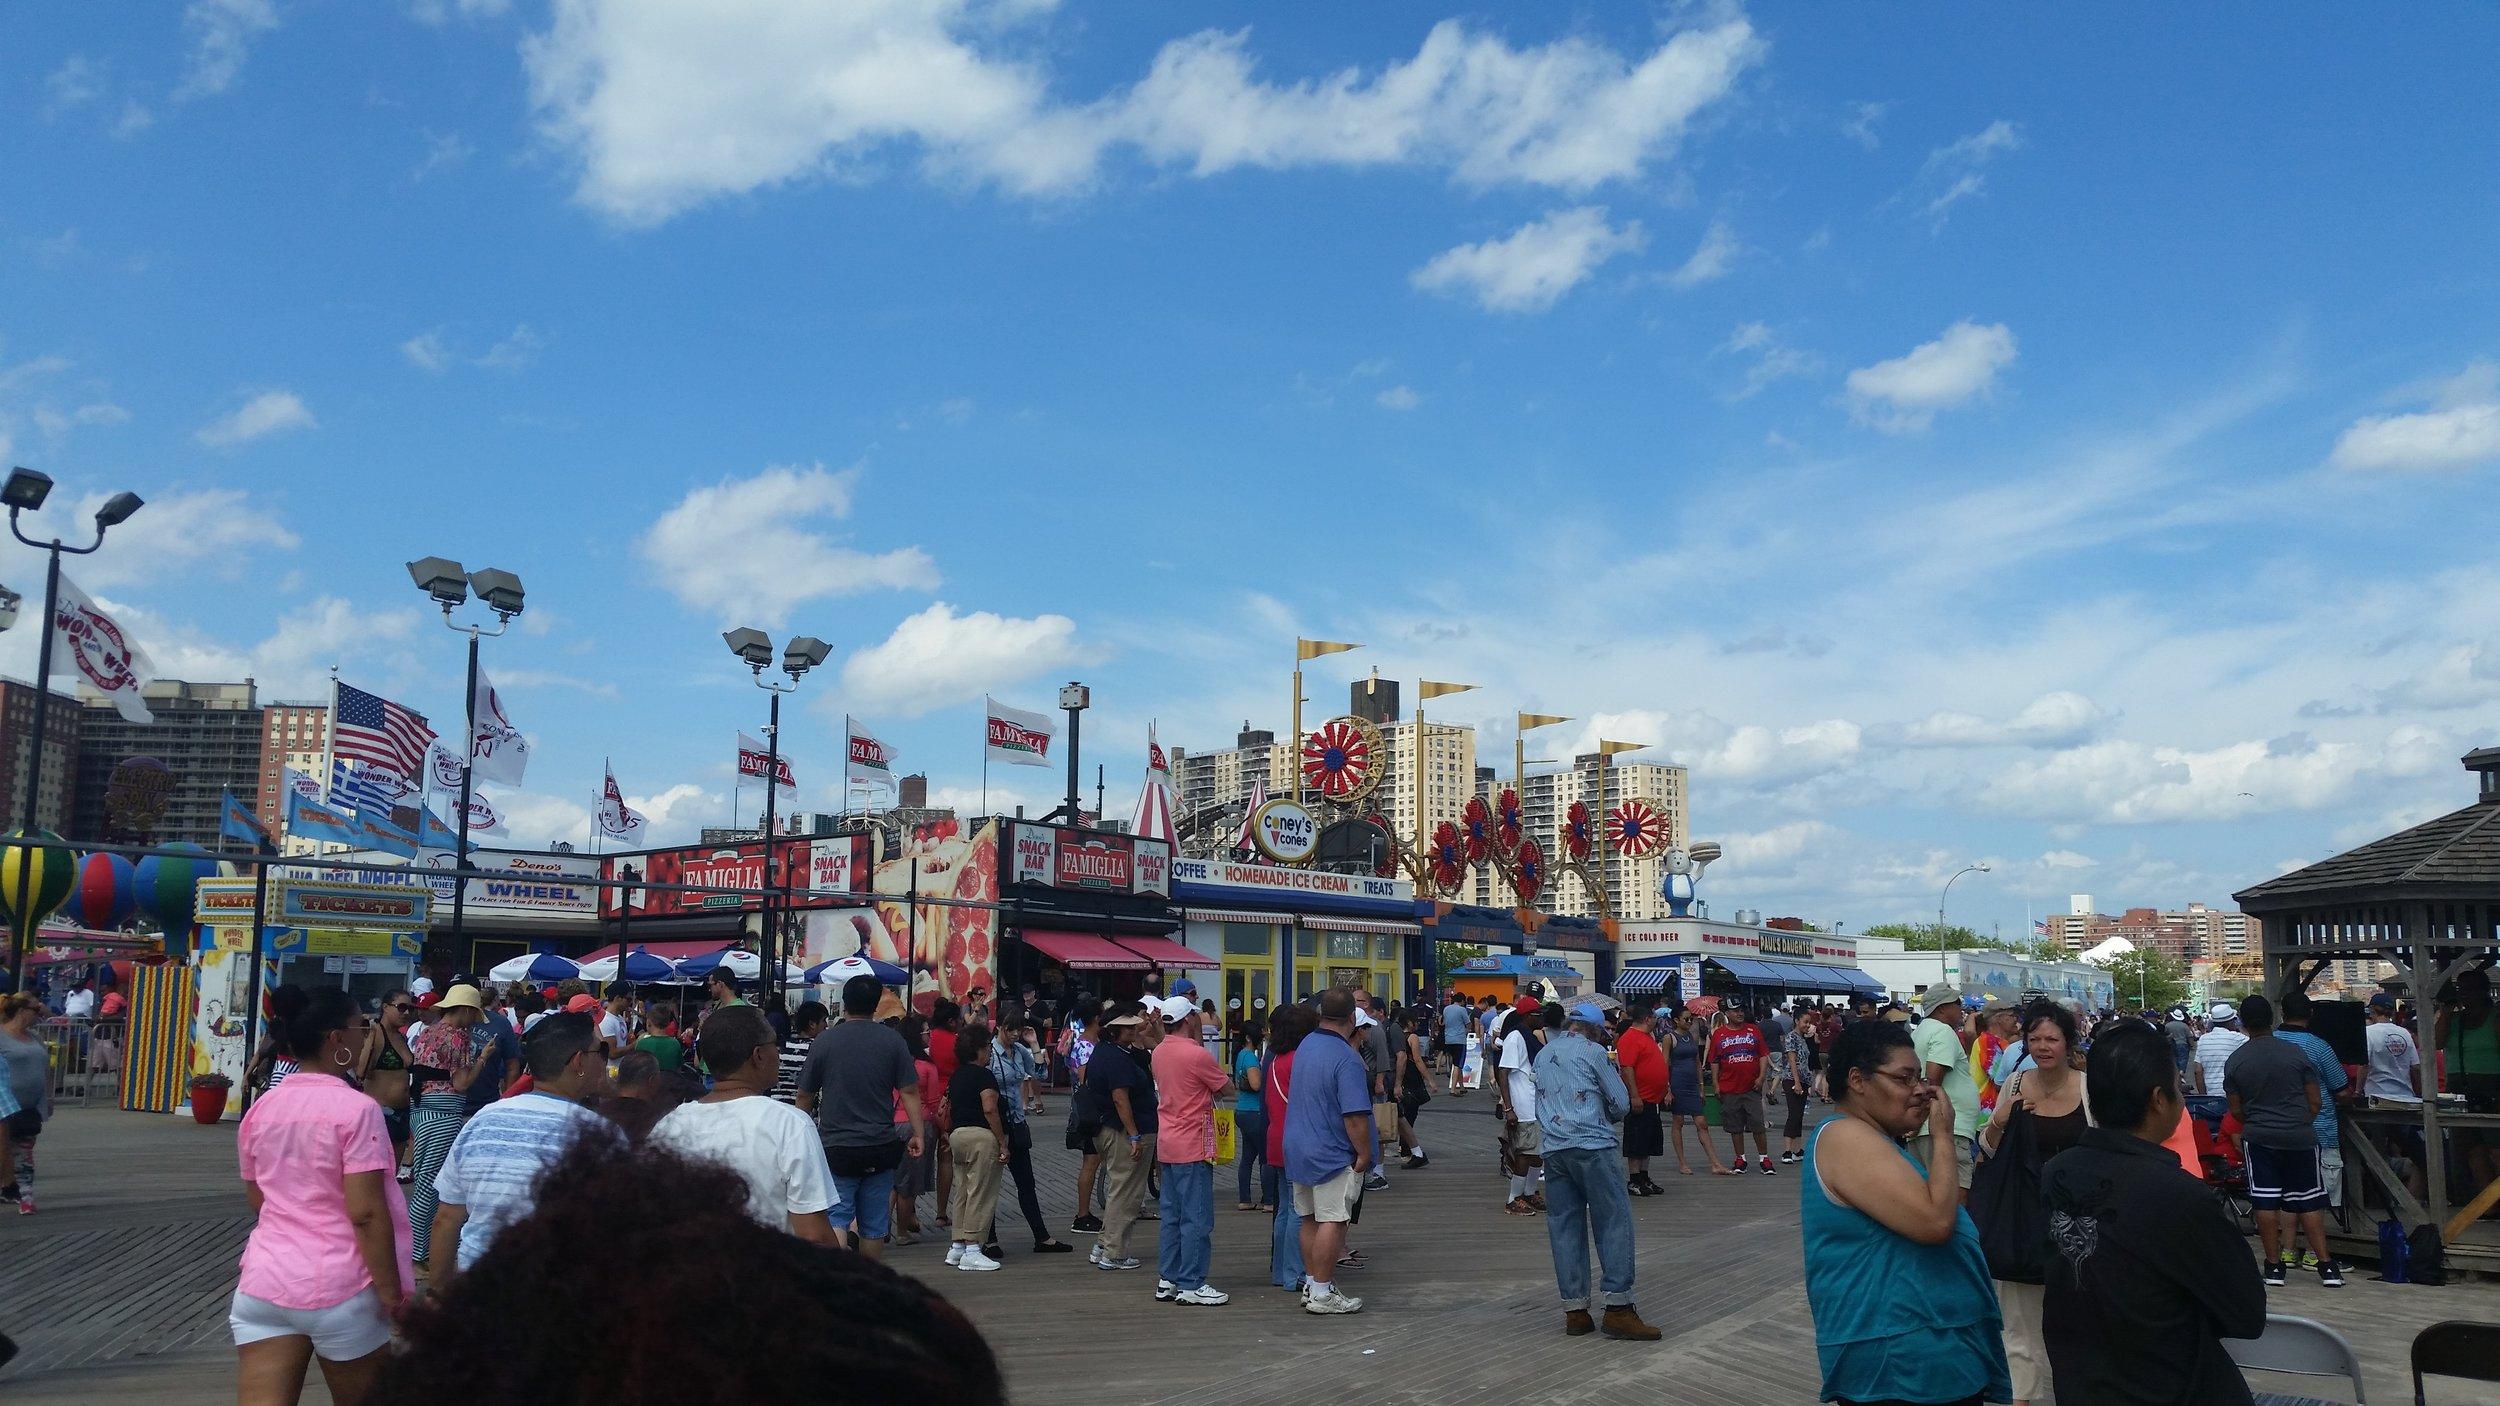 coney island7.jpg